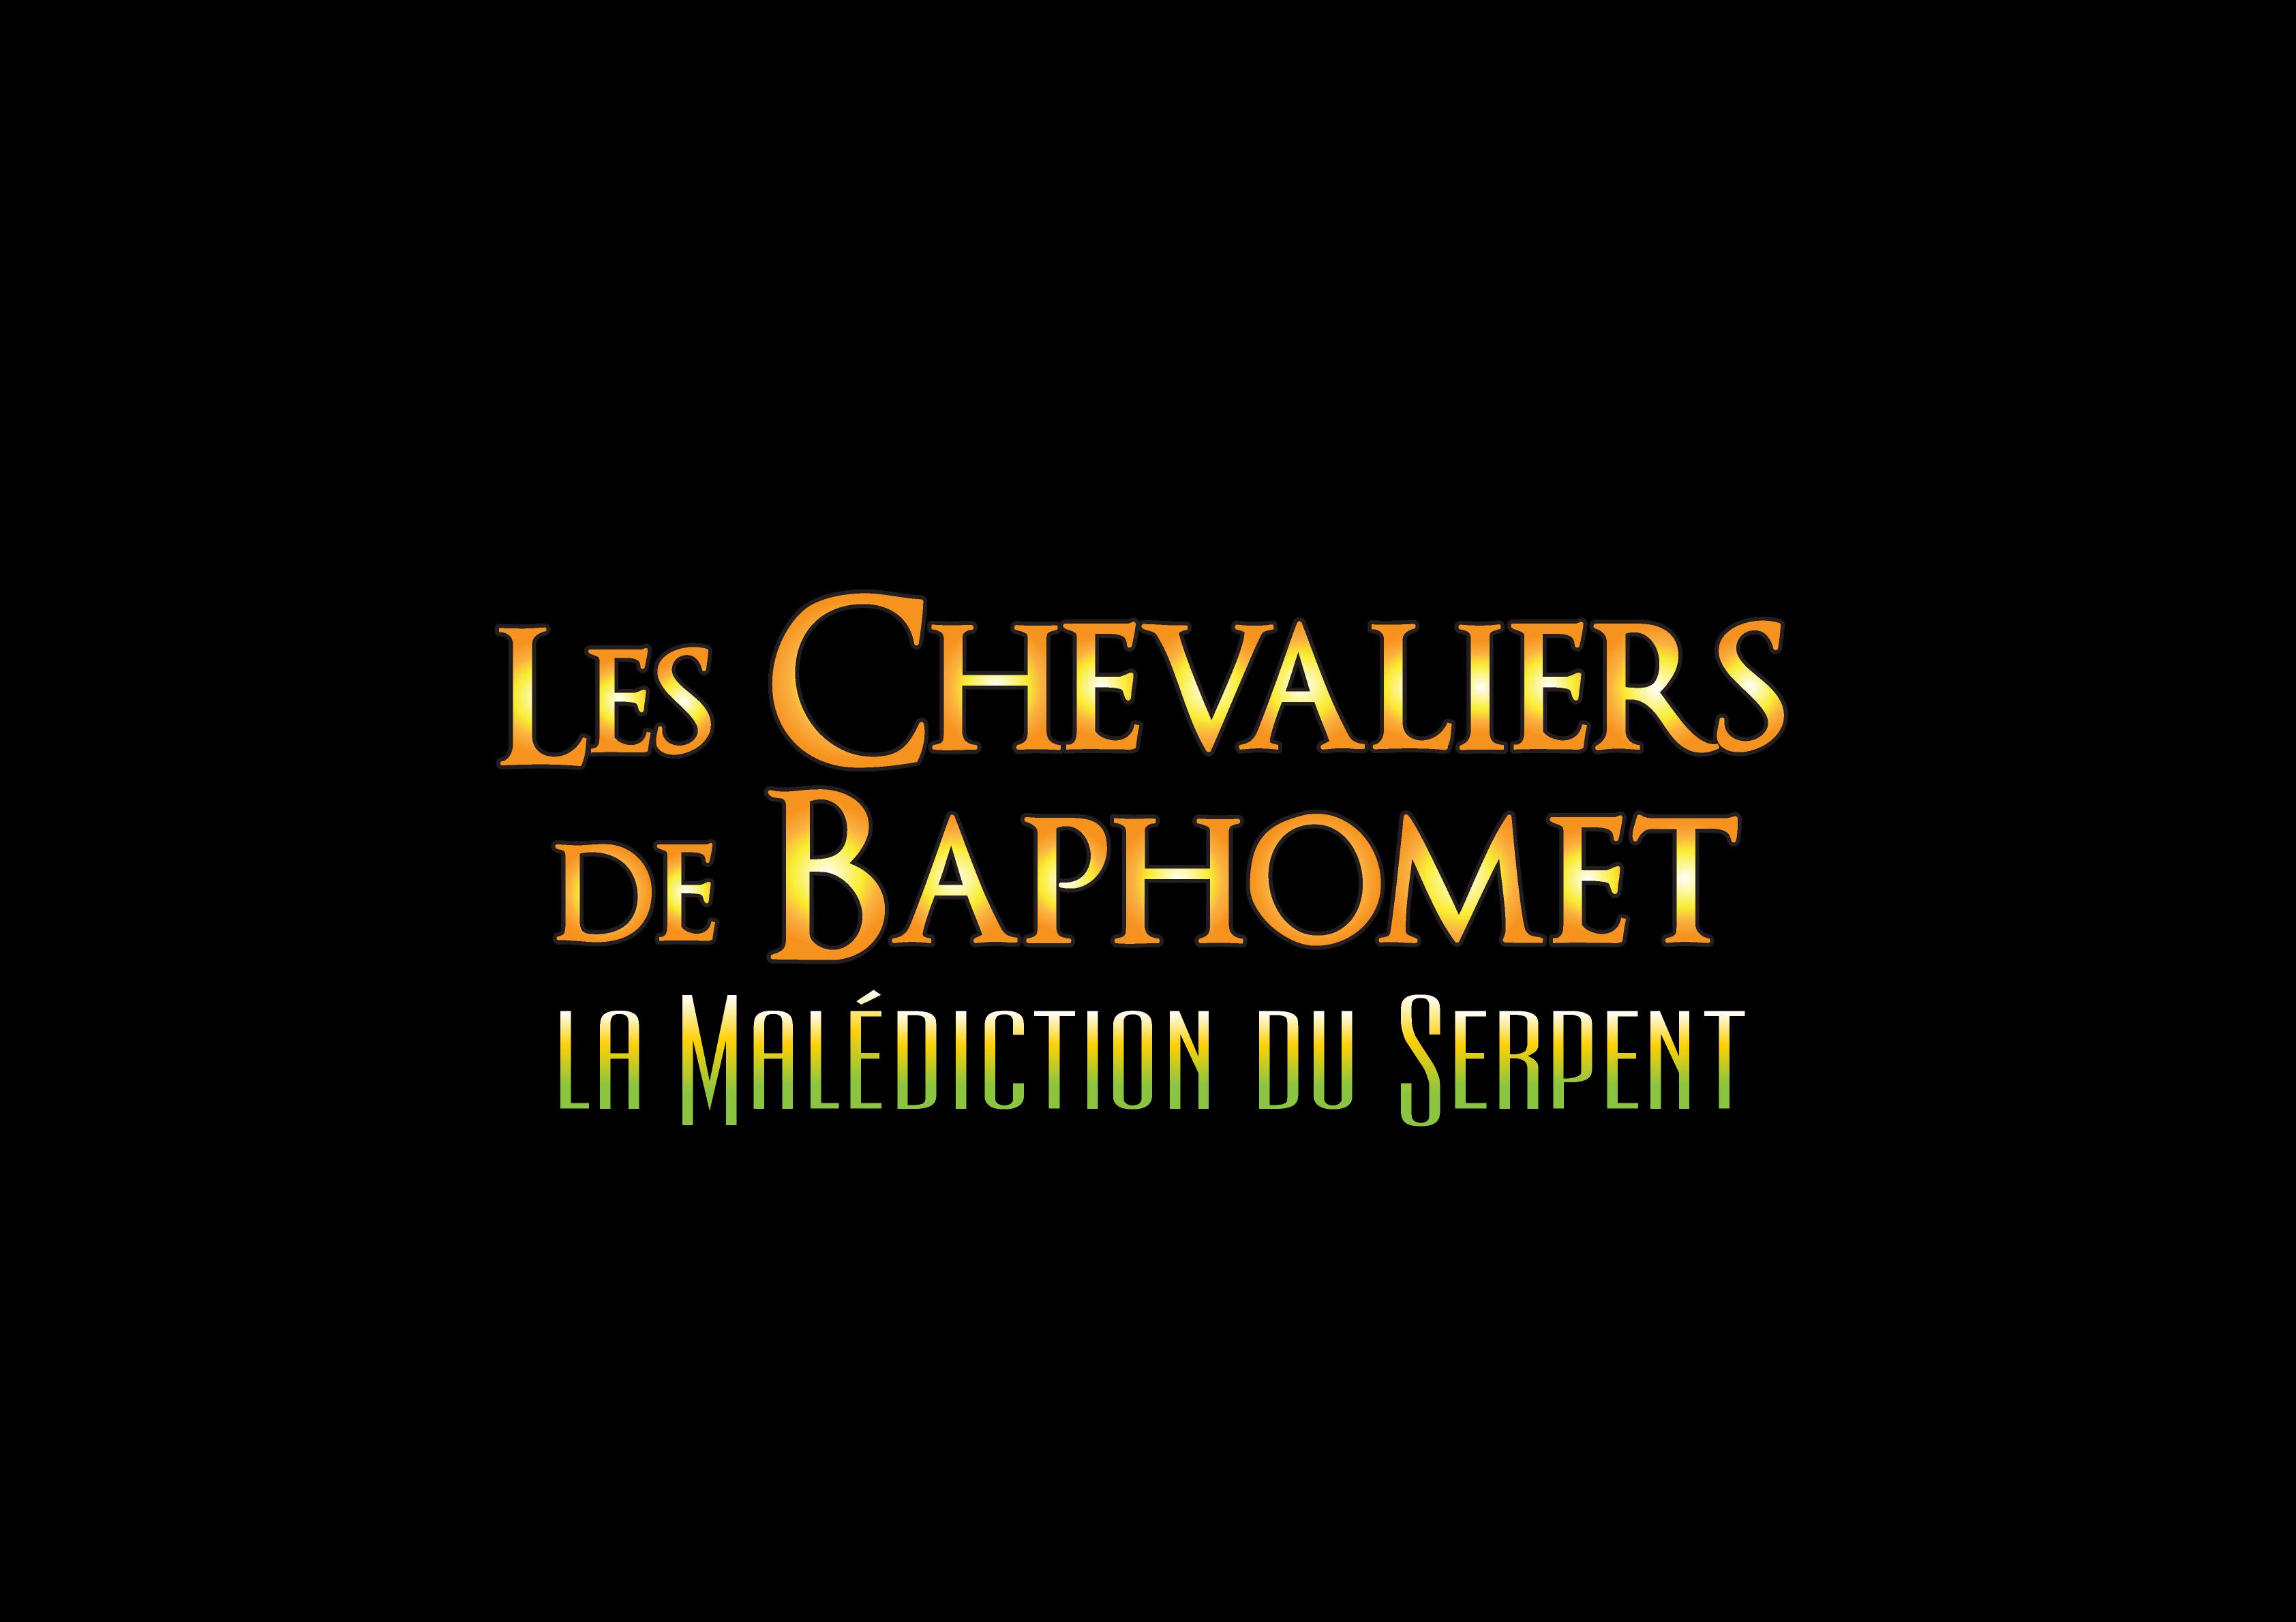 LesChevaliersdeBaphomet-LaMaledictionduSerpent Multi Div 005